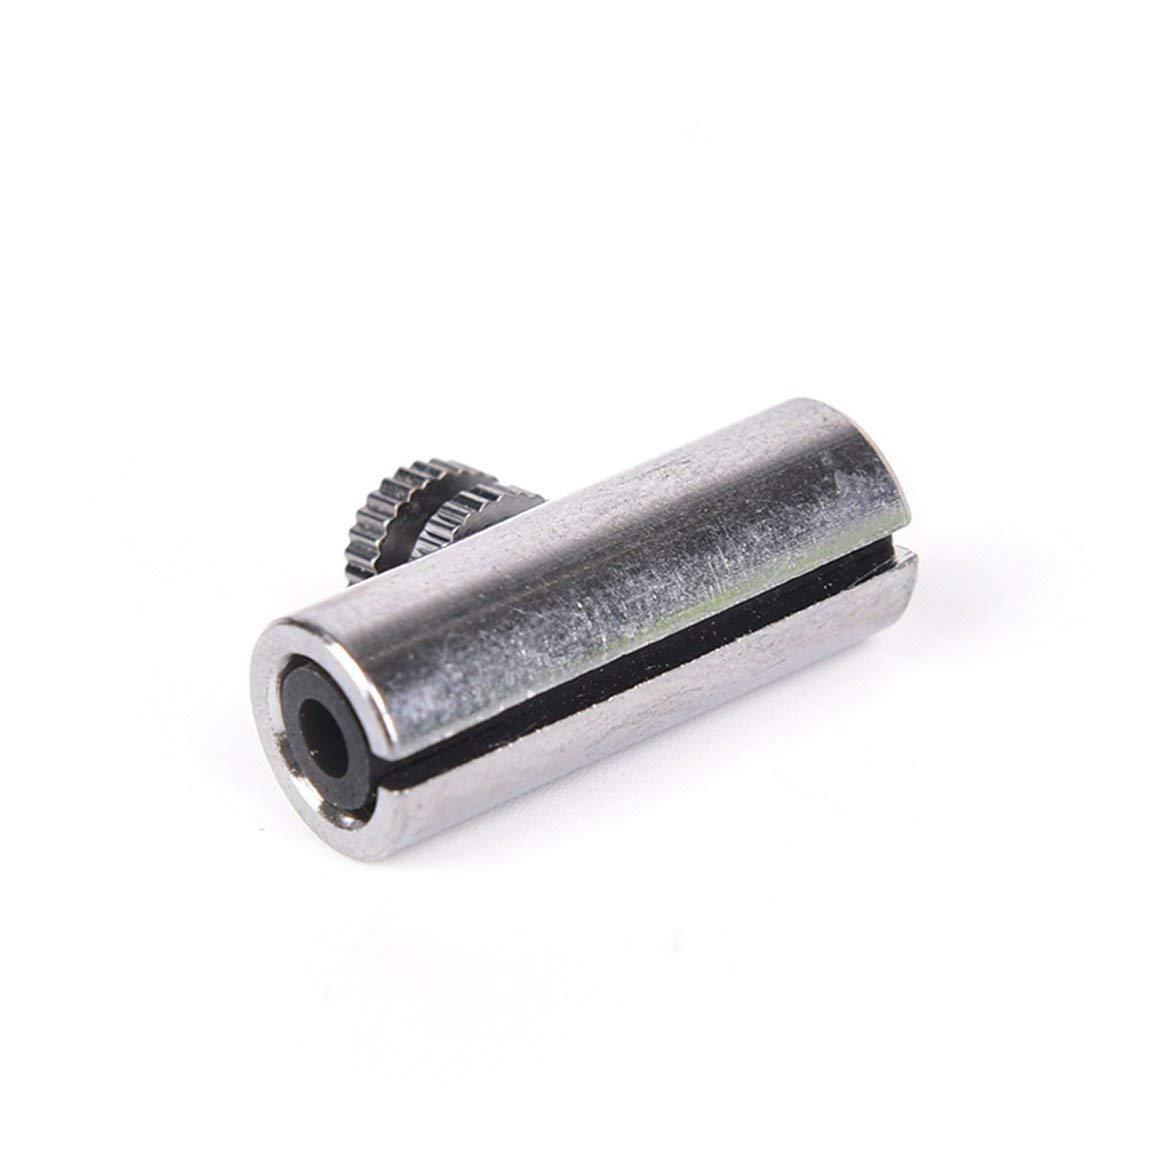 1 Pcs Cello Wolftone Wolf Tone Eliminator Note Suppressor Tuner Musical Intruments Parts Accessories - Silver SeniorMar